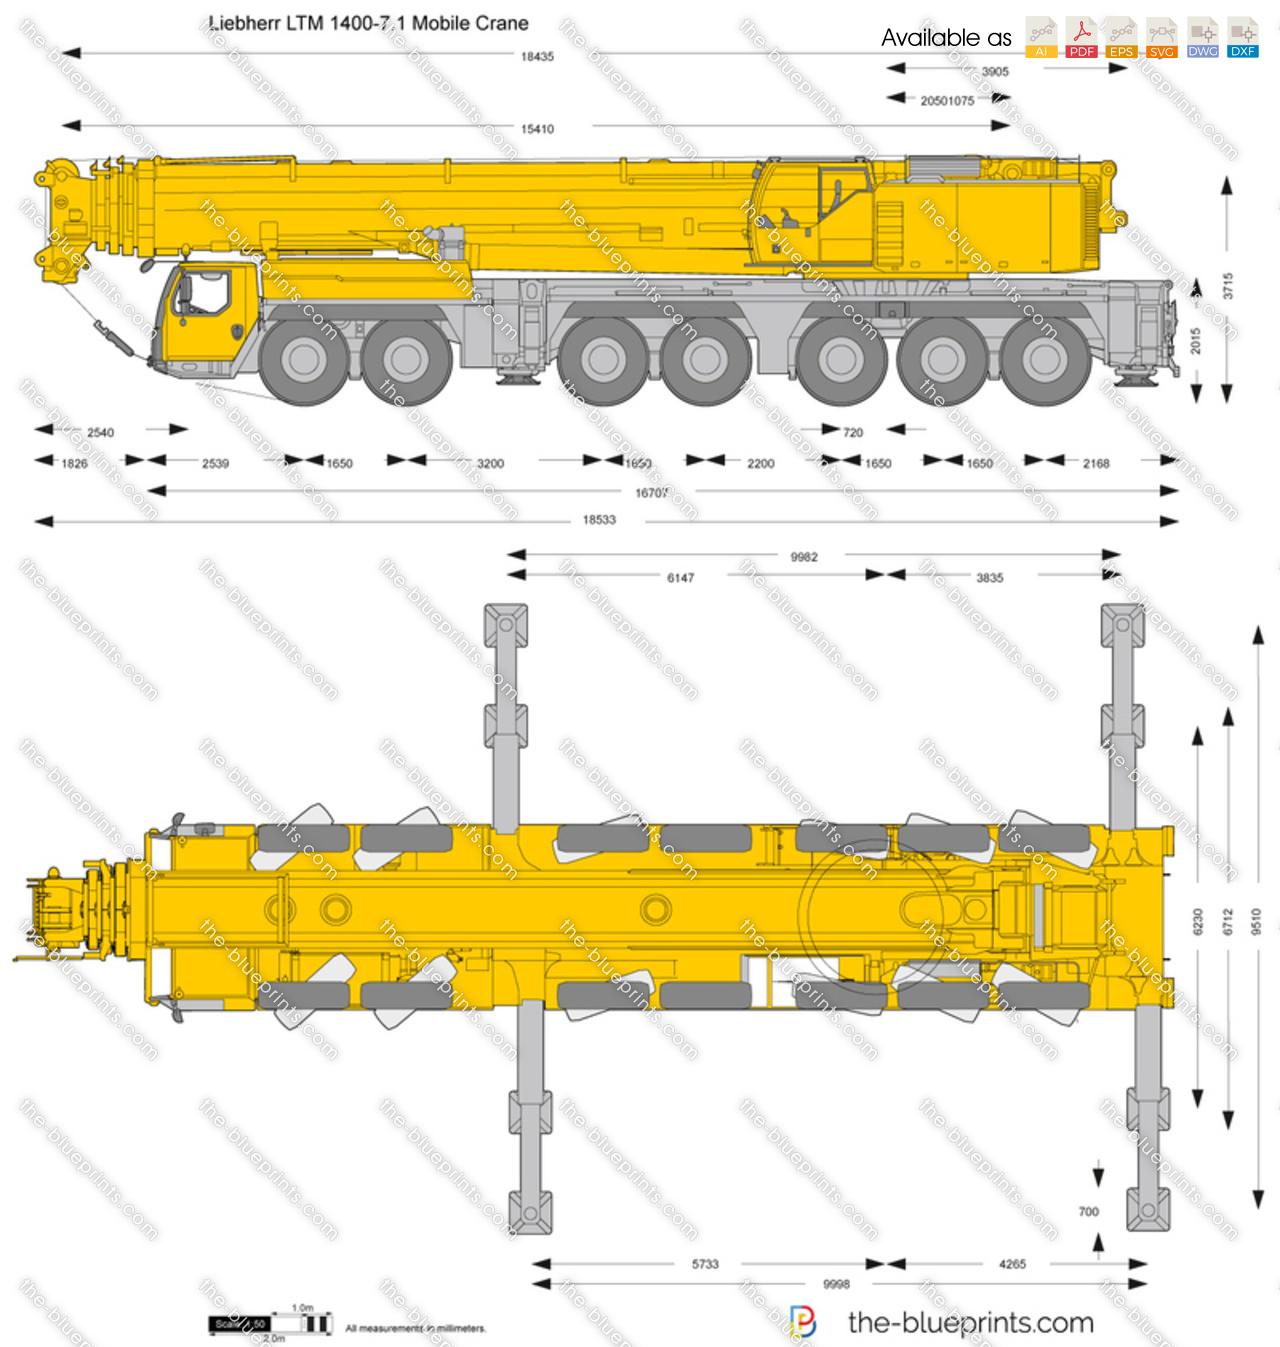 Liebherr LTM 1400-7.1 Mobile Crane